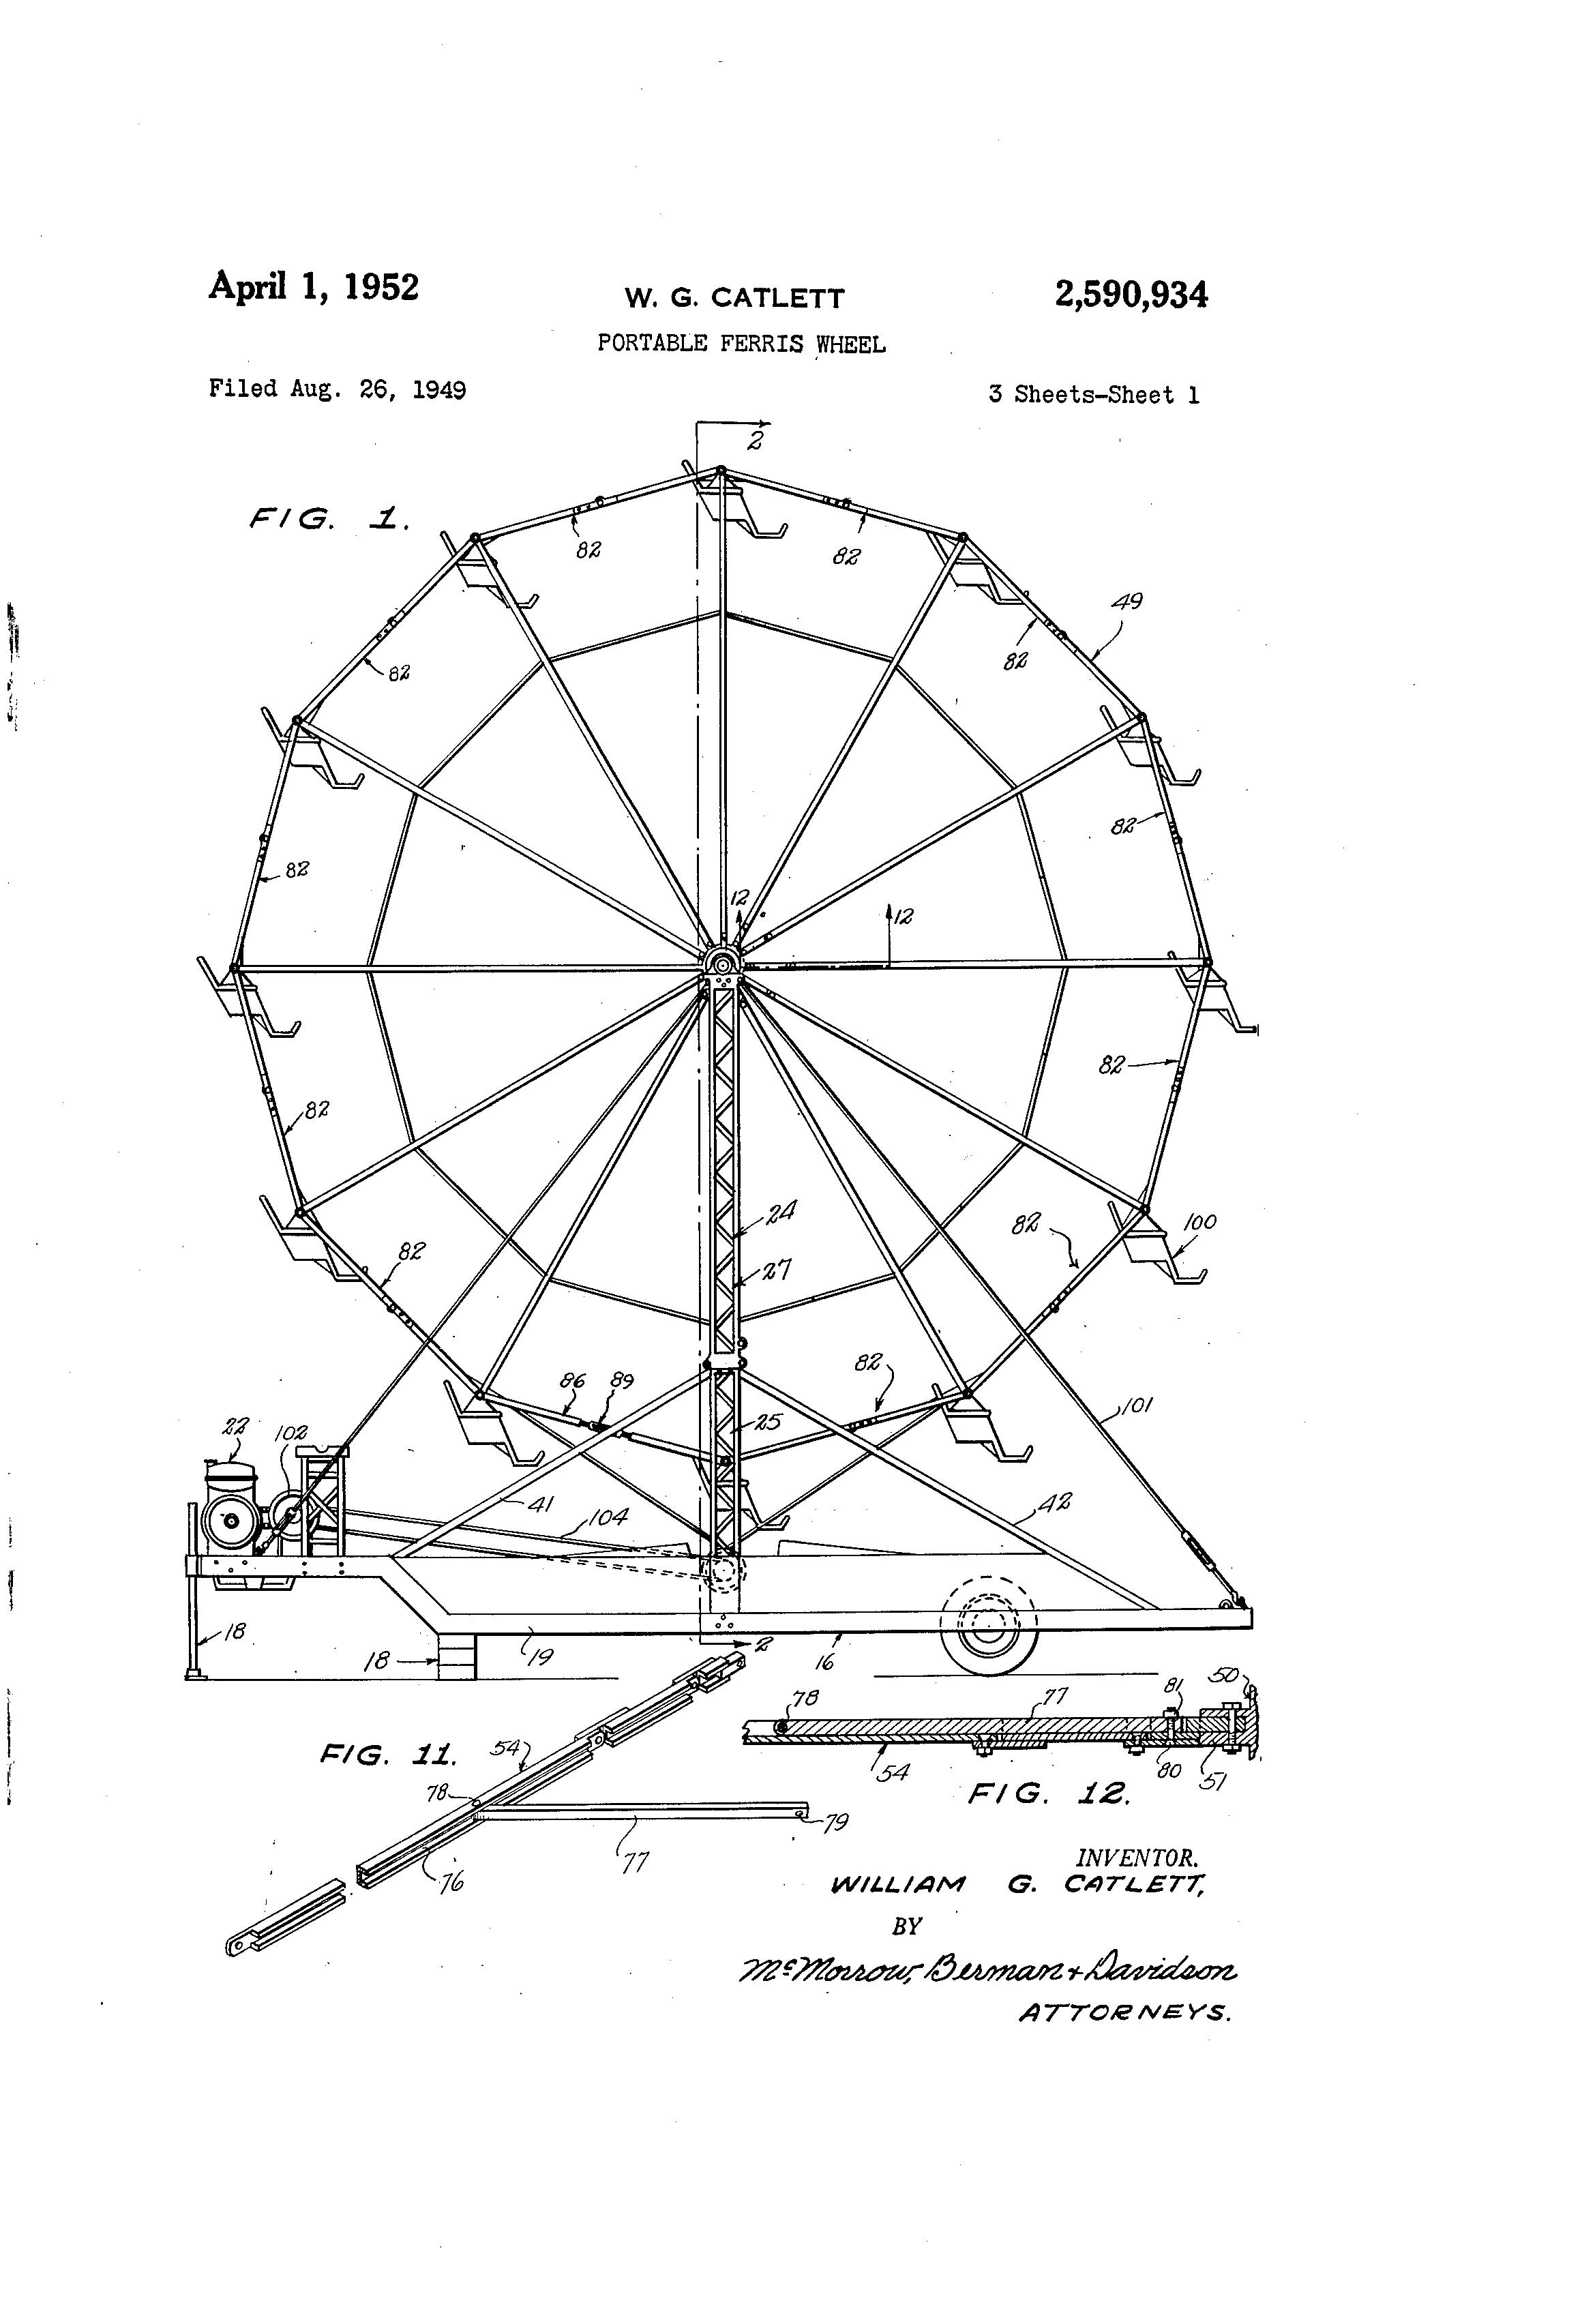 Portable Ferris Wheel patent illustration from  patents.google.com